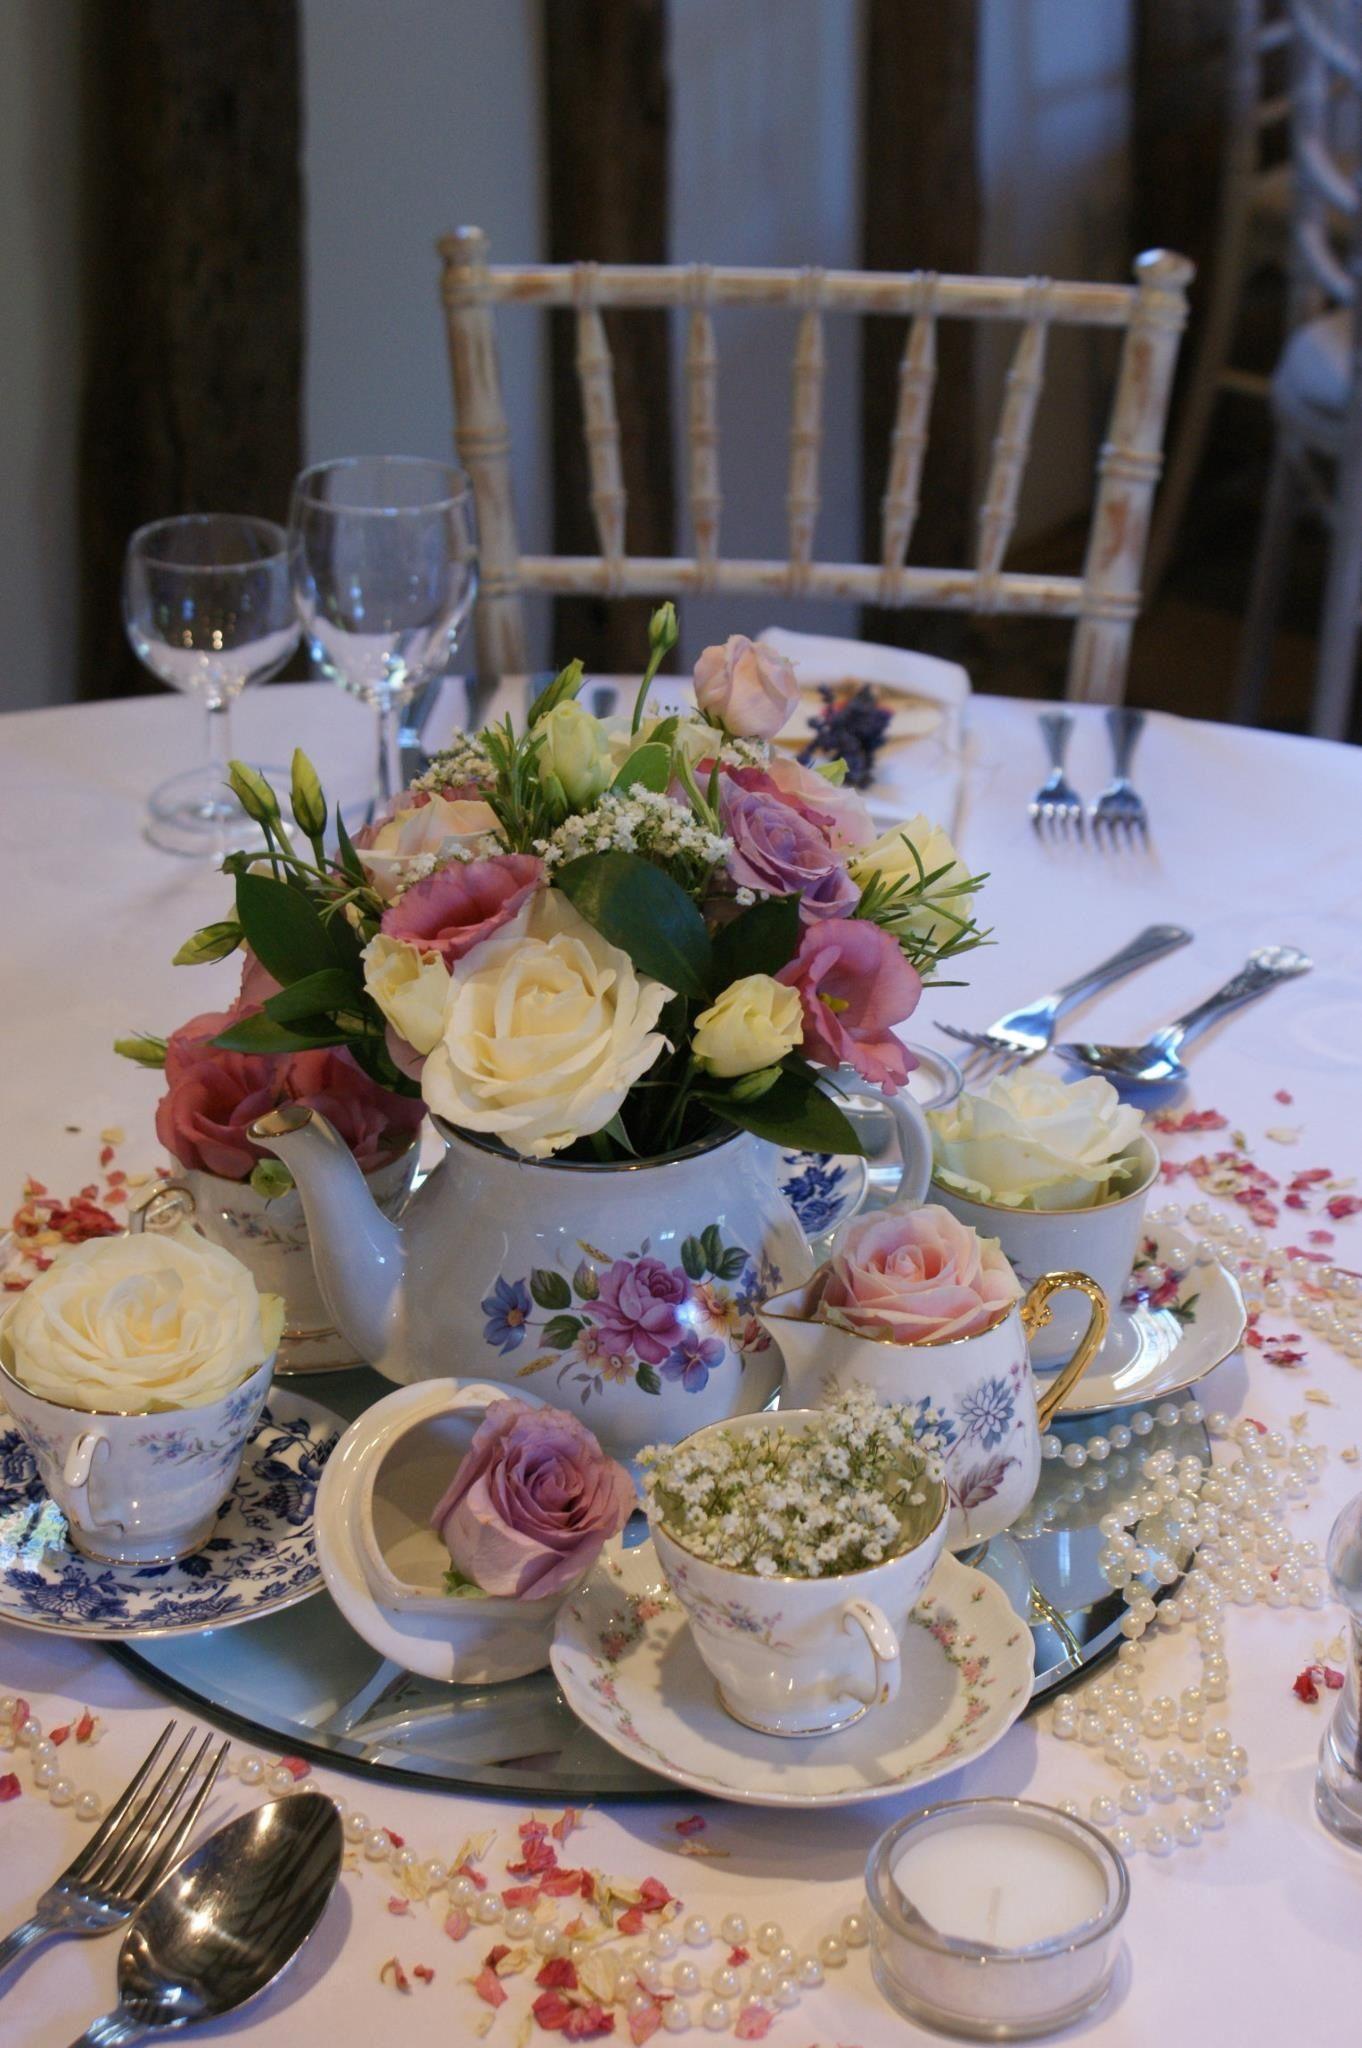 The teacup arrangement you liked party decor